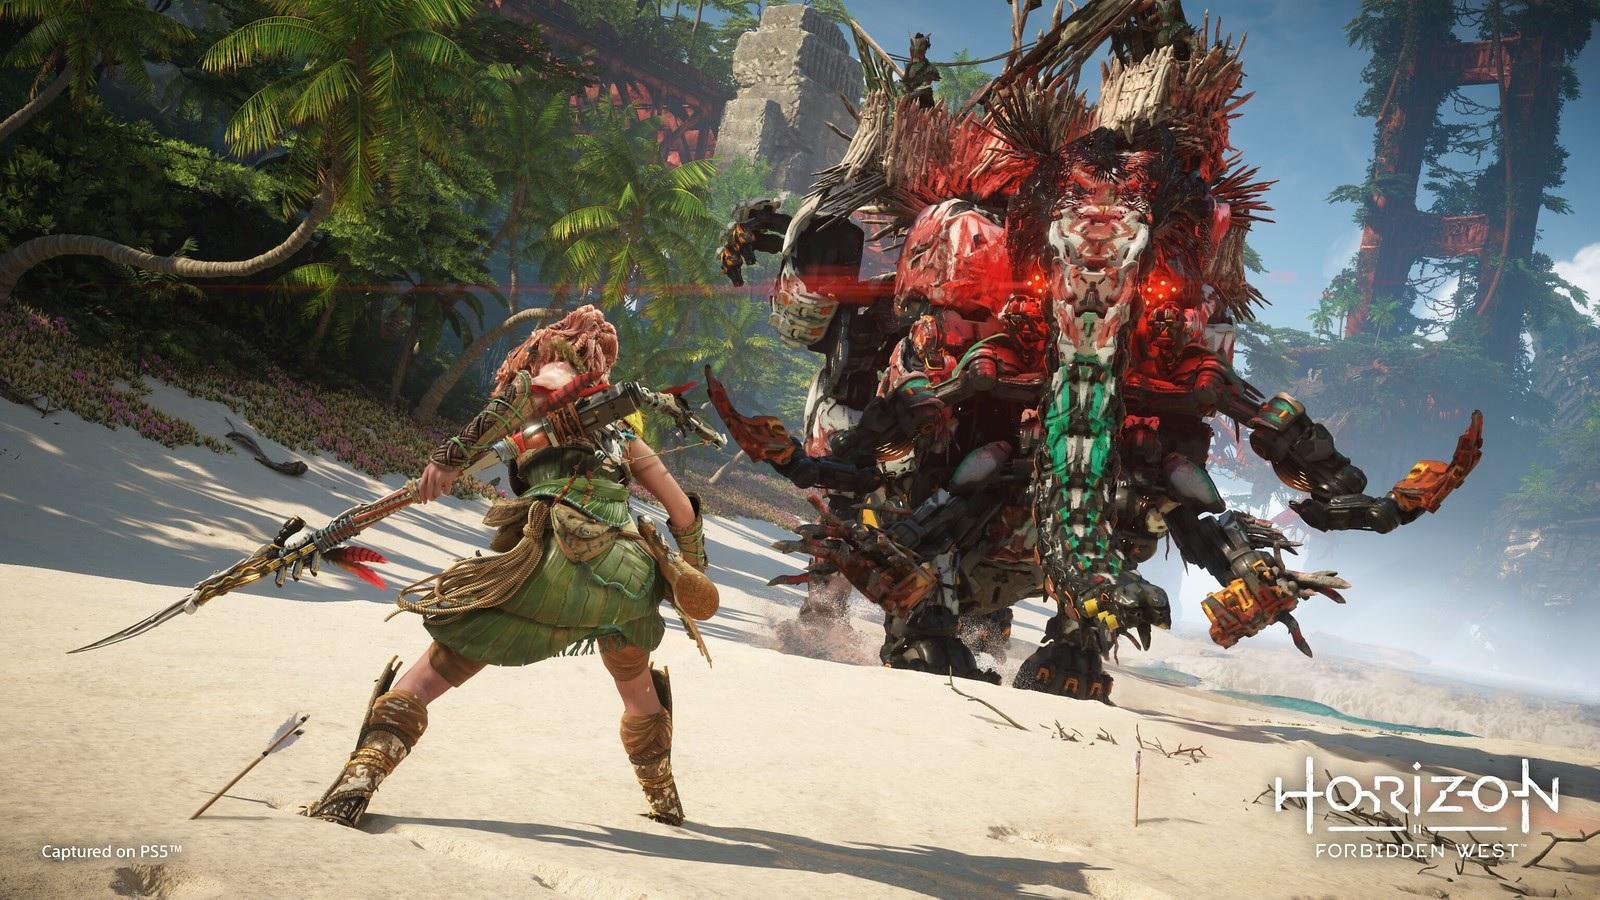 Jogos: Horizon Forbidden West é adiado para fevereiro de 2022